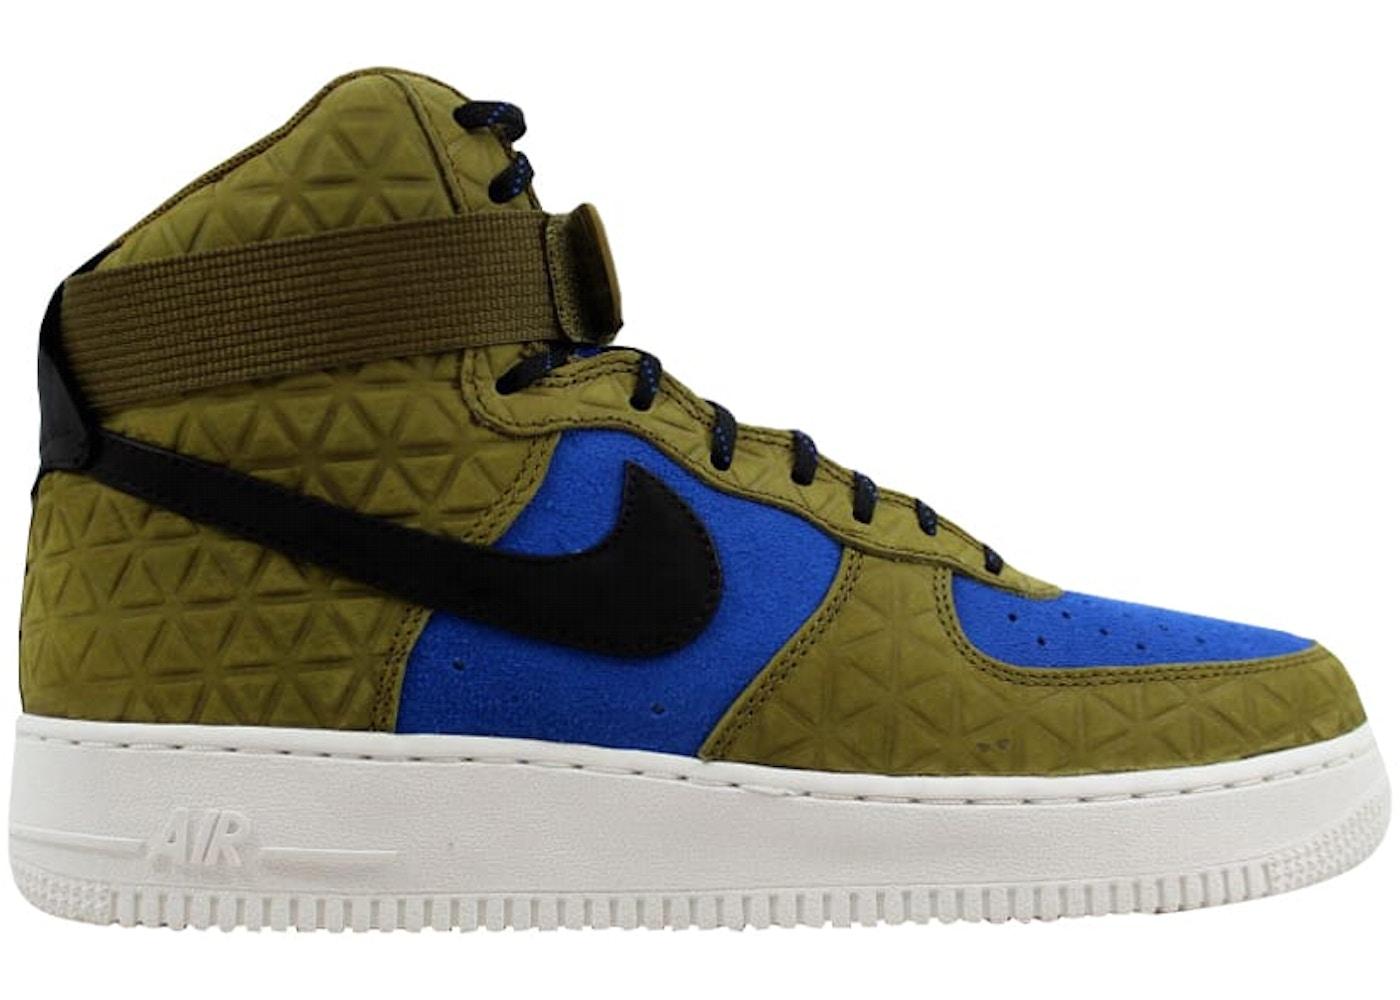 Nike Air Force 1 Hi Premium Suede Olive Flak Black Midnight Turquoise W 845065 300